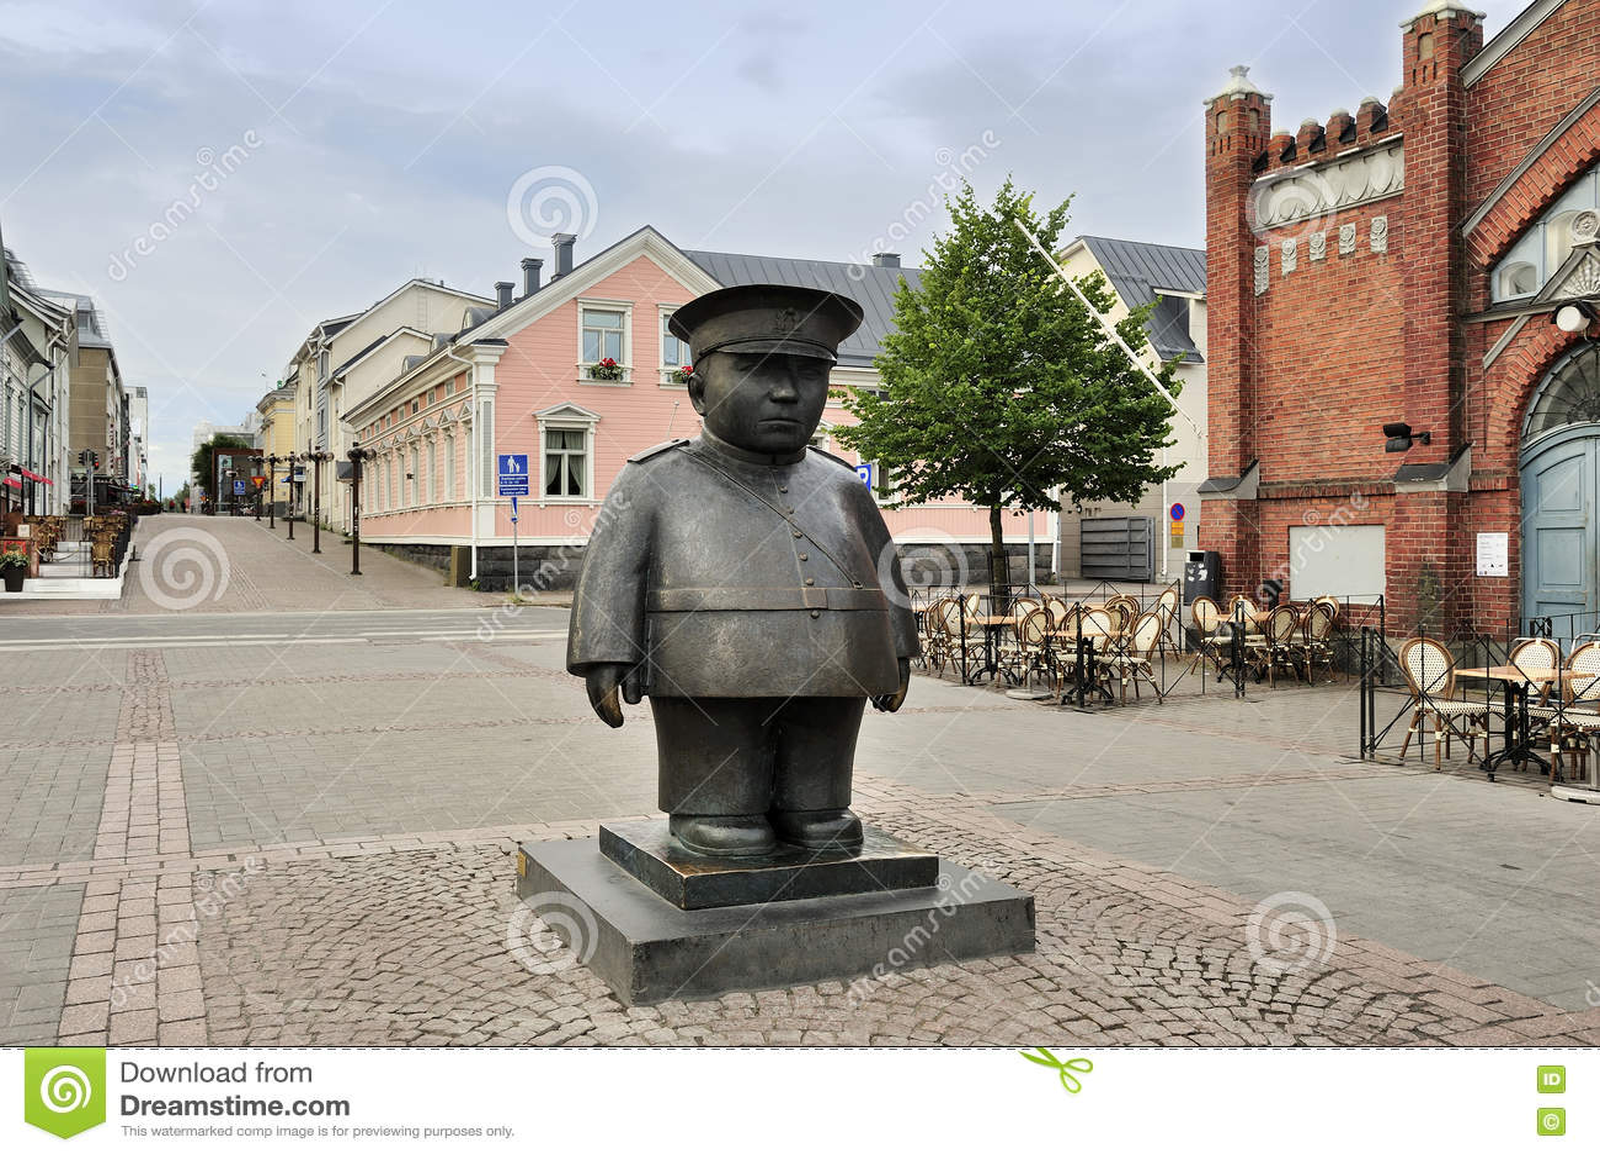 The bronze sculpture toripolliisi bobby at market